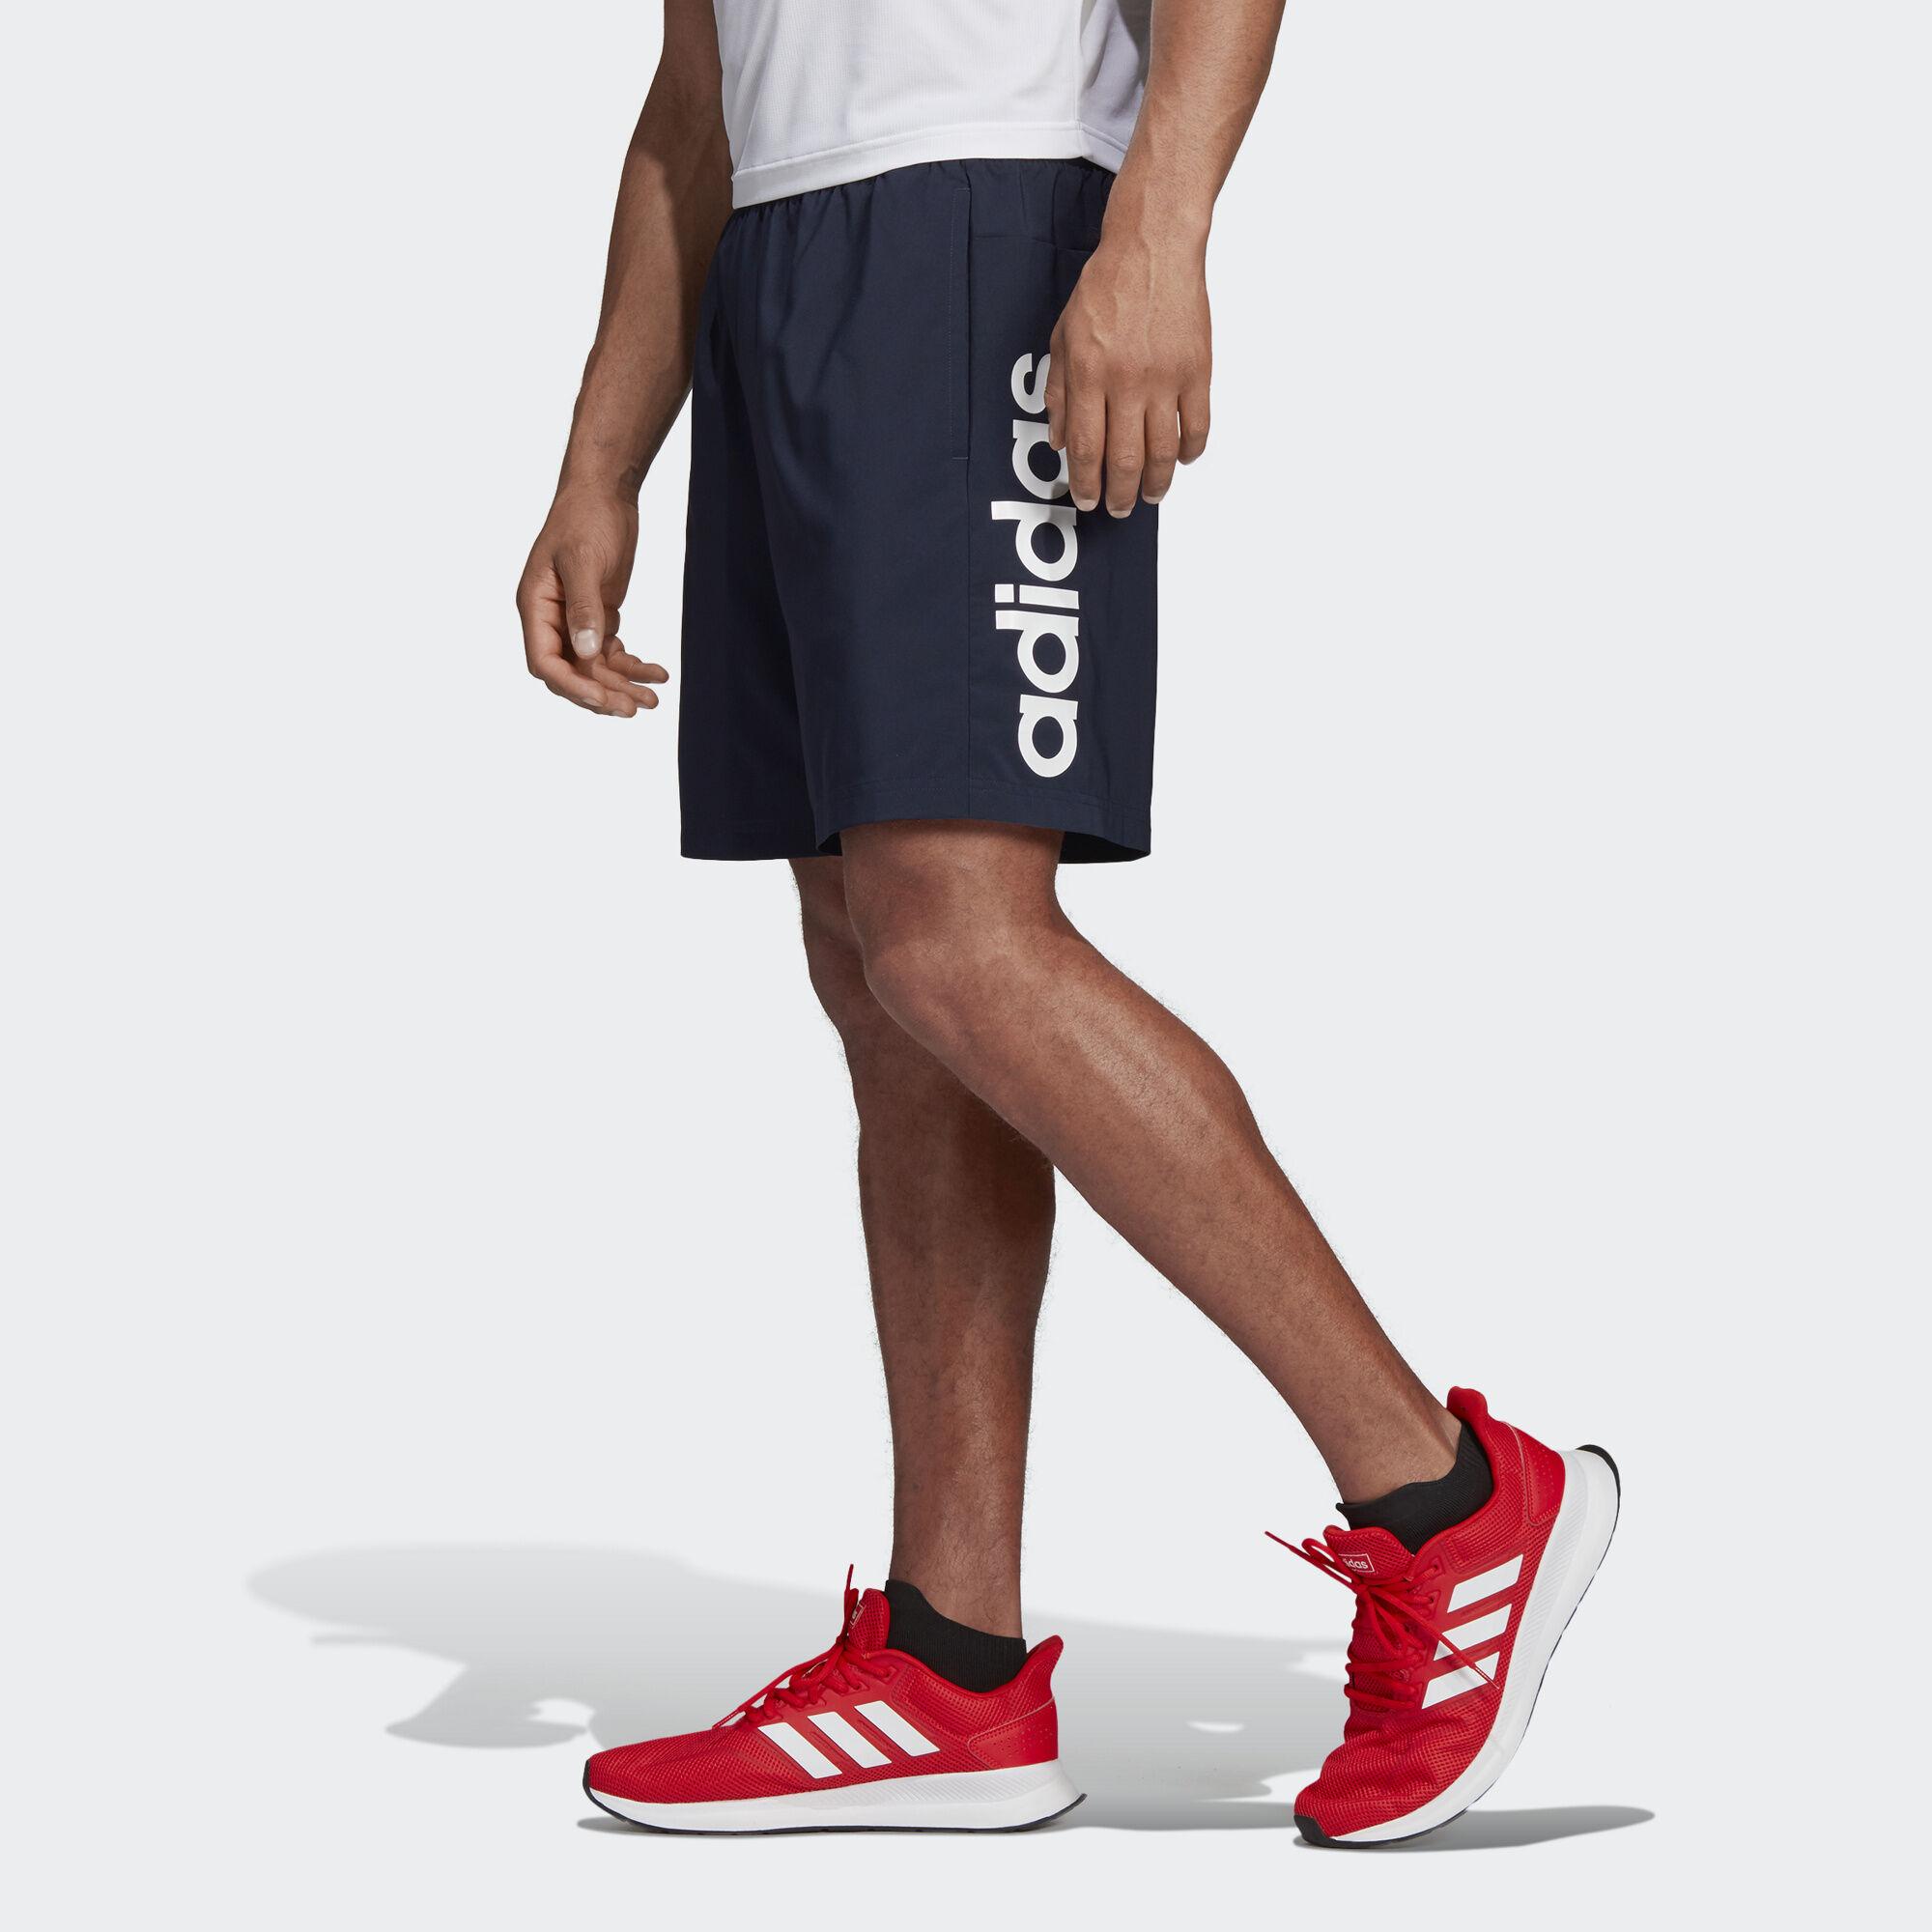 a2e37d4128 adidas - Essentials Linear Chelsea Shorts Legend Ink   White DU0418